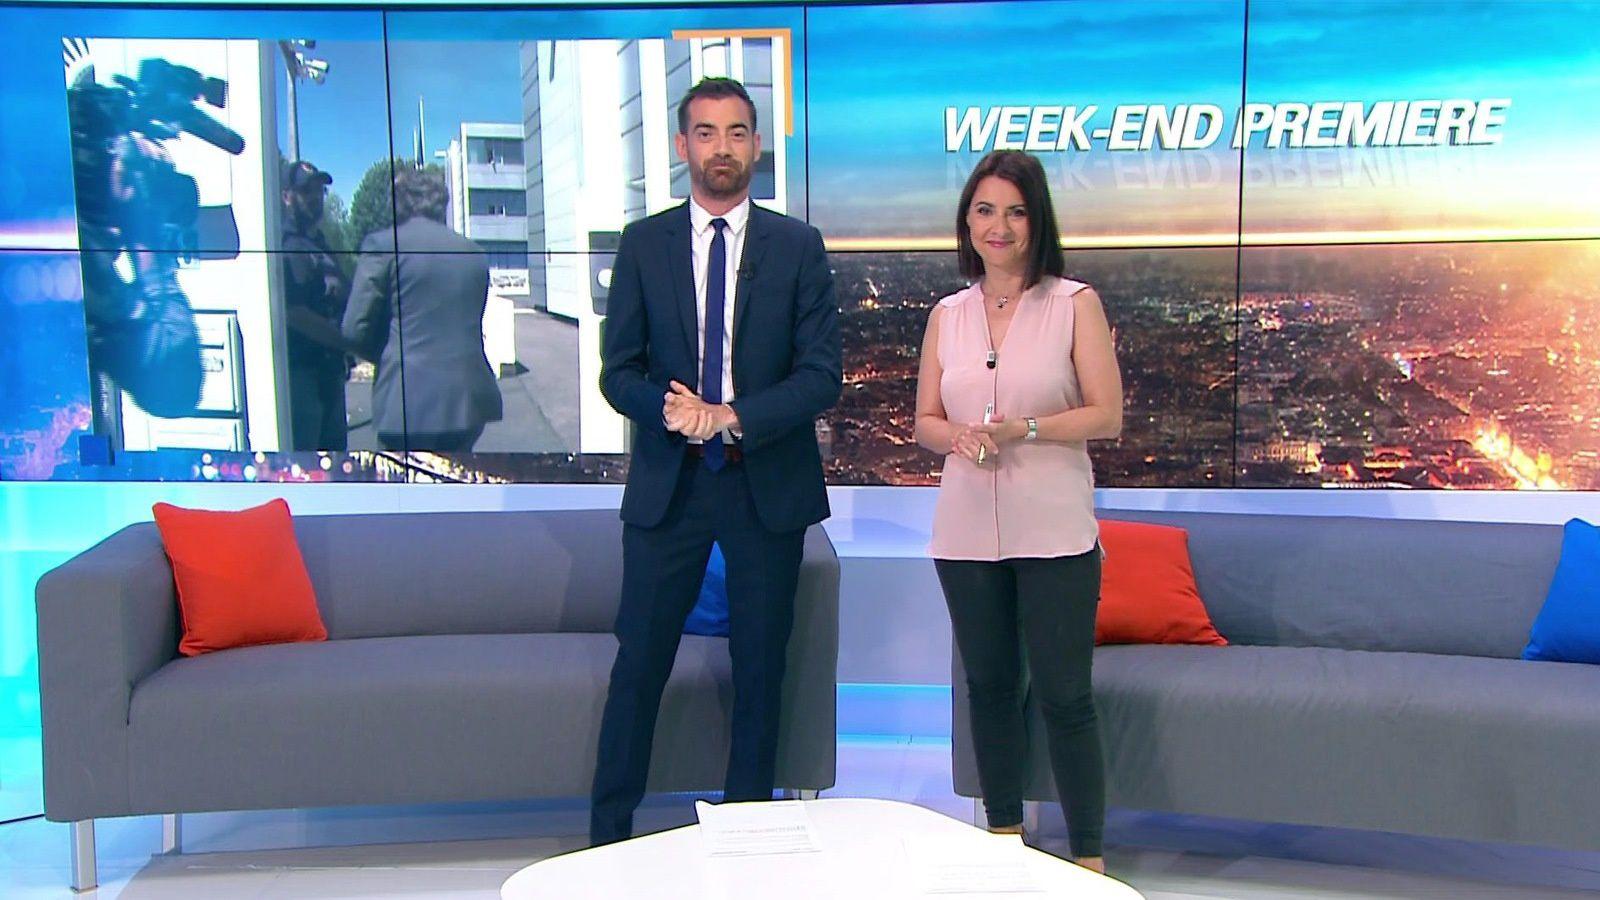 📸8 WEEK-END PREMIERE @BFMTV @BFMTVmatinaleWE @SandraGandoin @JohannaCarlosD8 ce matin #vuesalatele